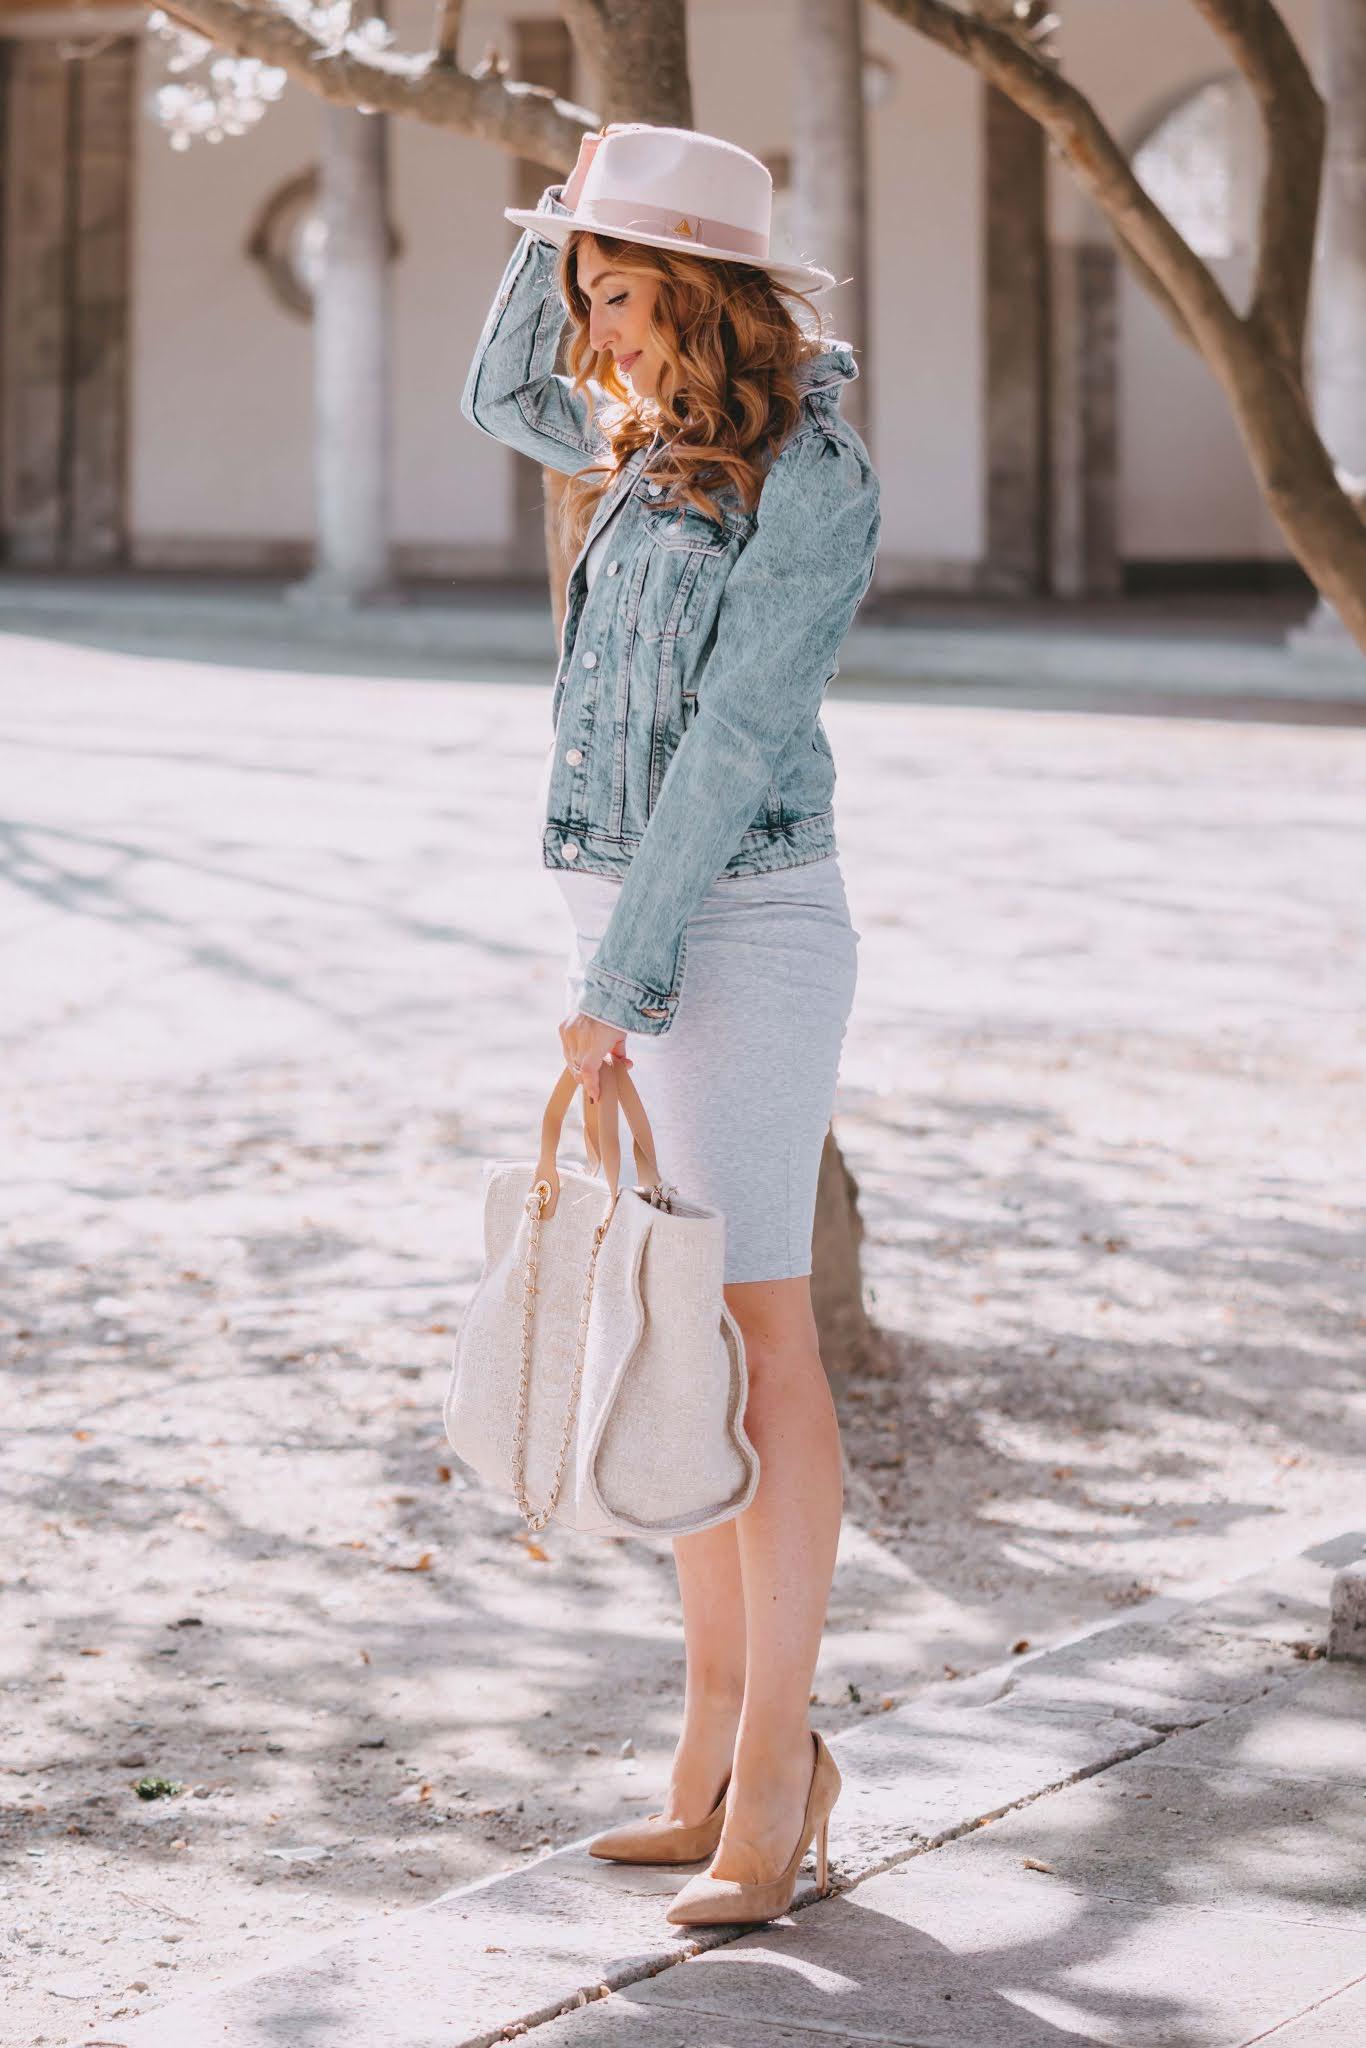 Fashionstylebyjohanna-schwanger-Frühlingsoutfit-fashionblogger-umstandsmode